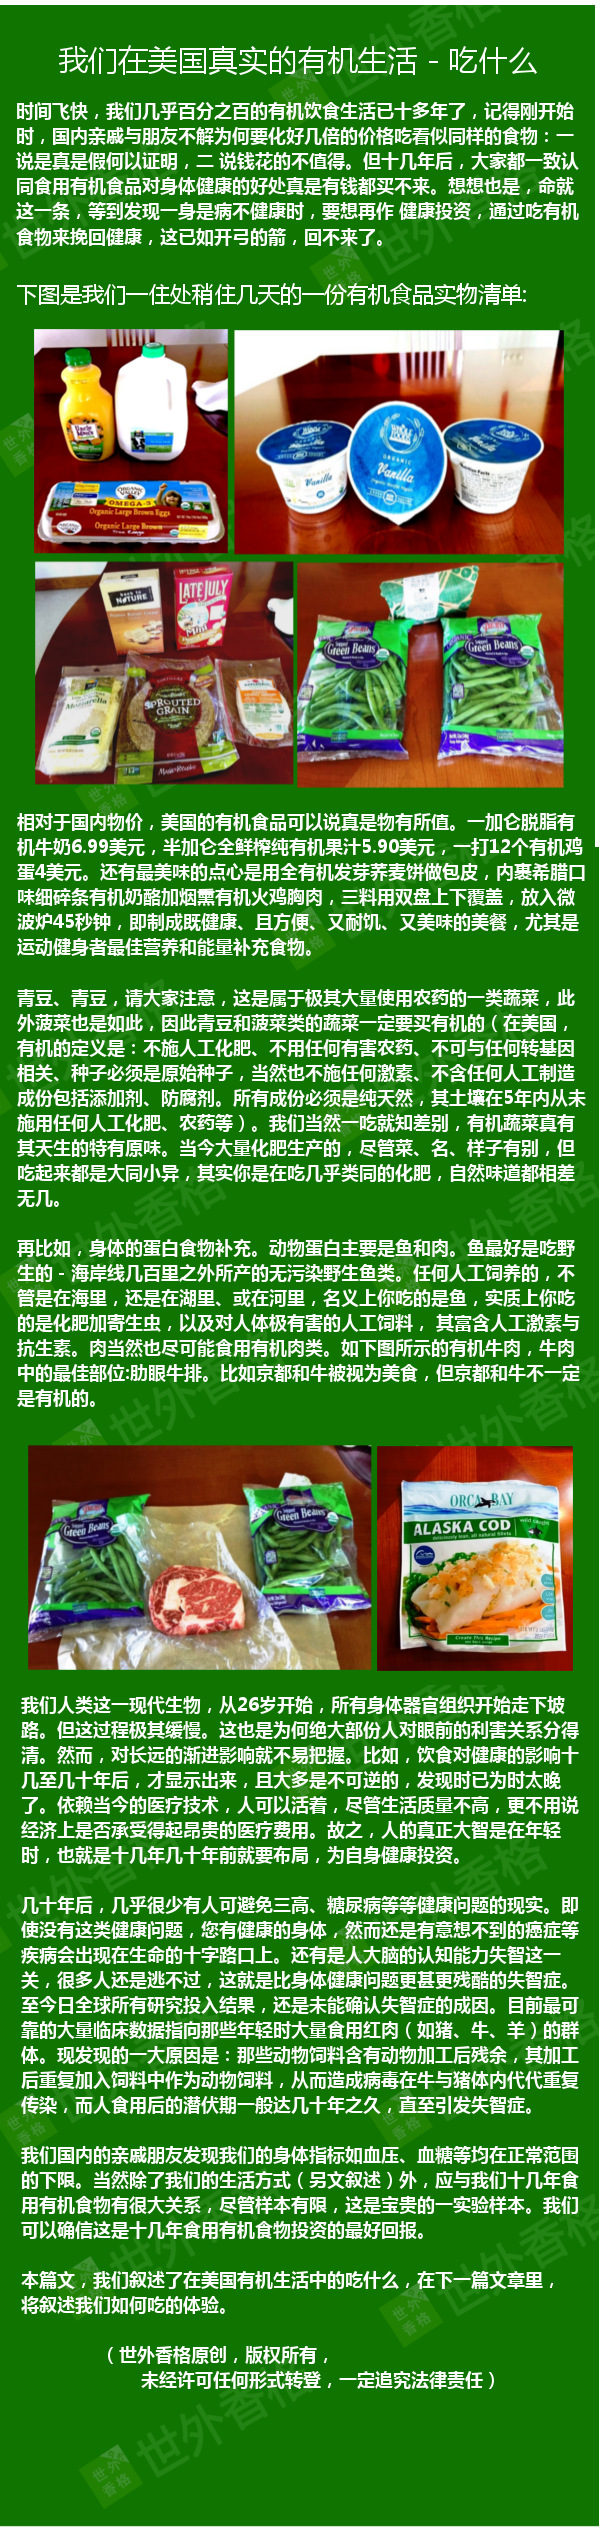 http://www.swxiangge.com/data/upload/shop/article/05286154530278624.jpg